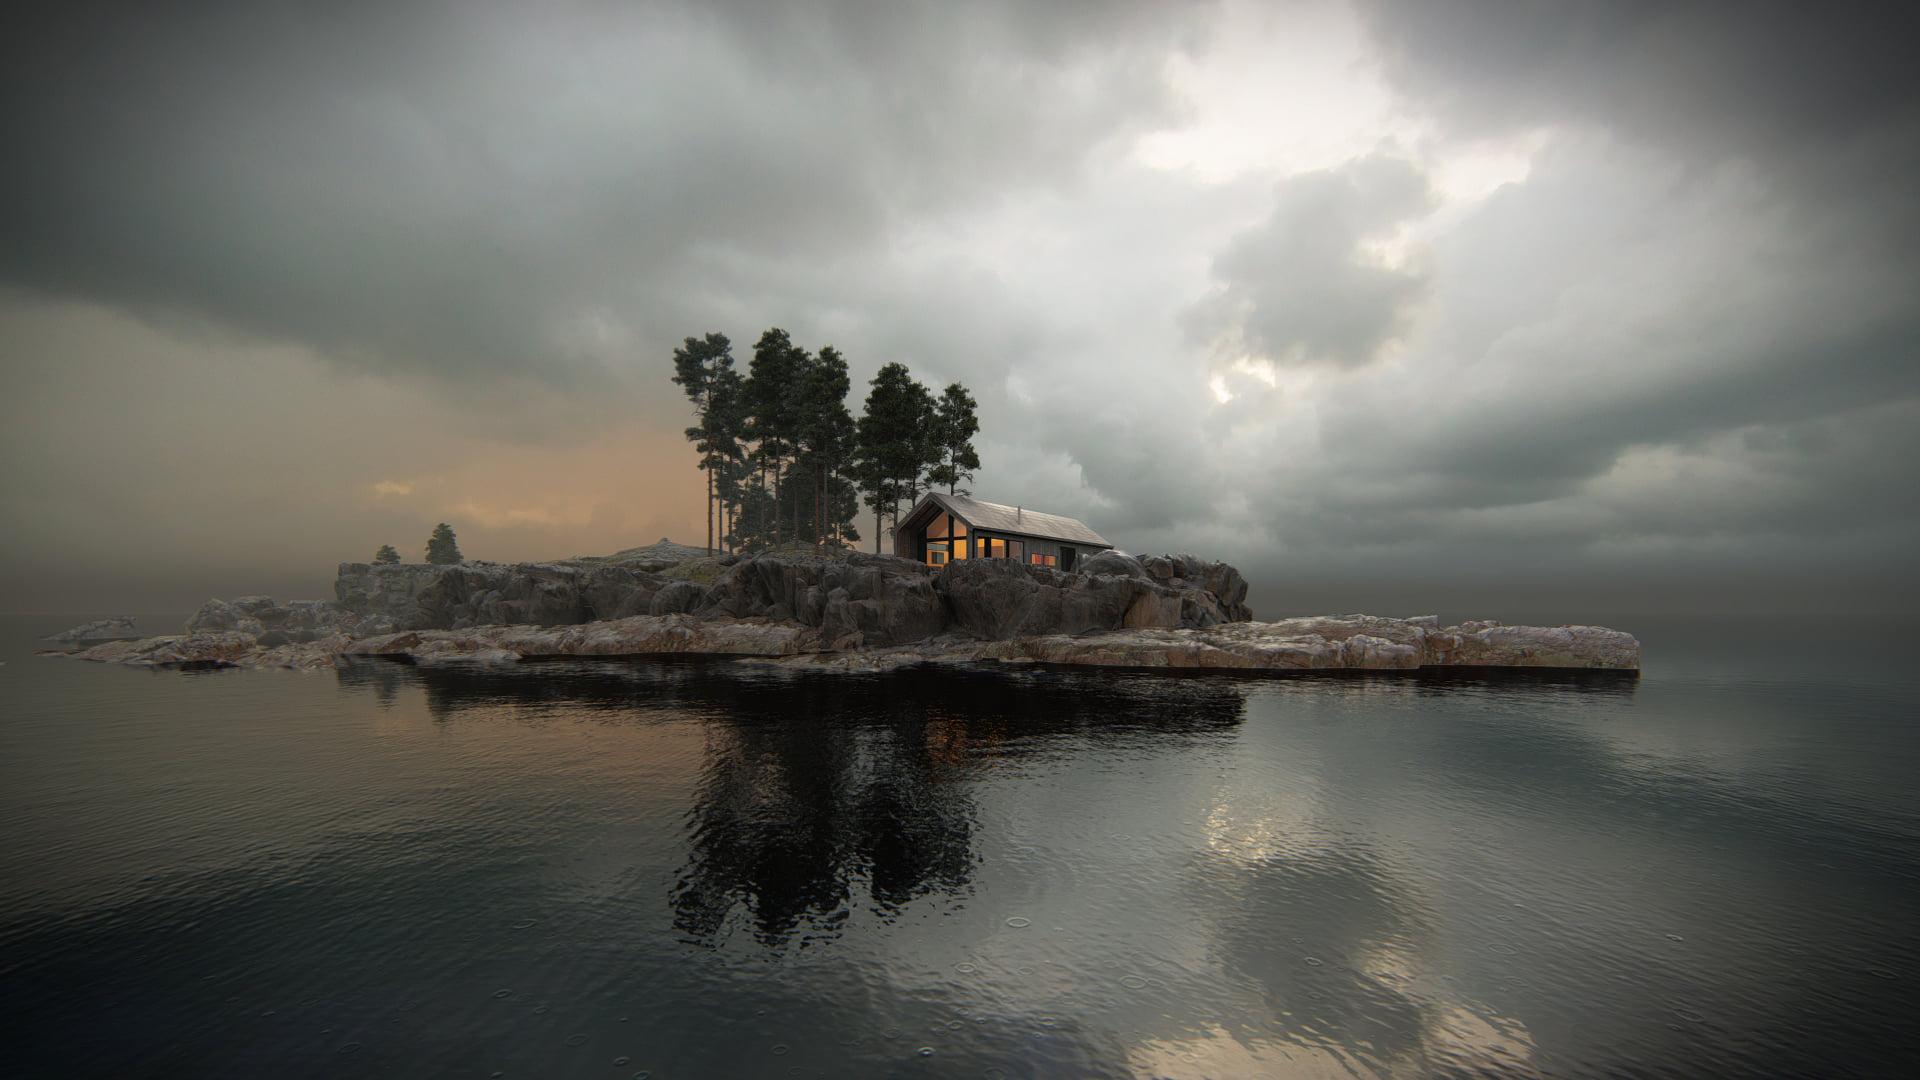 Winter cabin, designed by Vårdal Arkitekter AS and rendered in Lumion 11 by Bartosz Orliński .